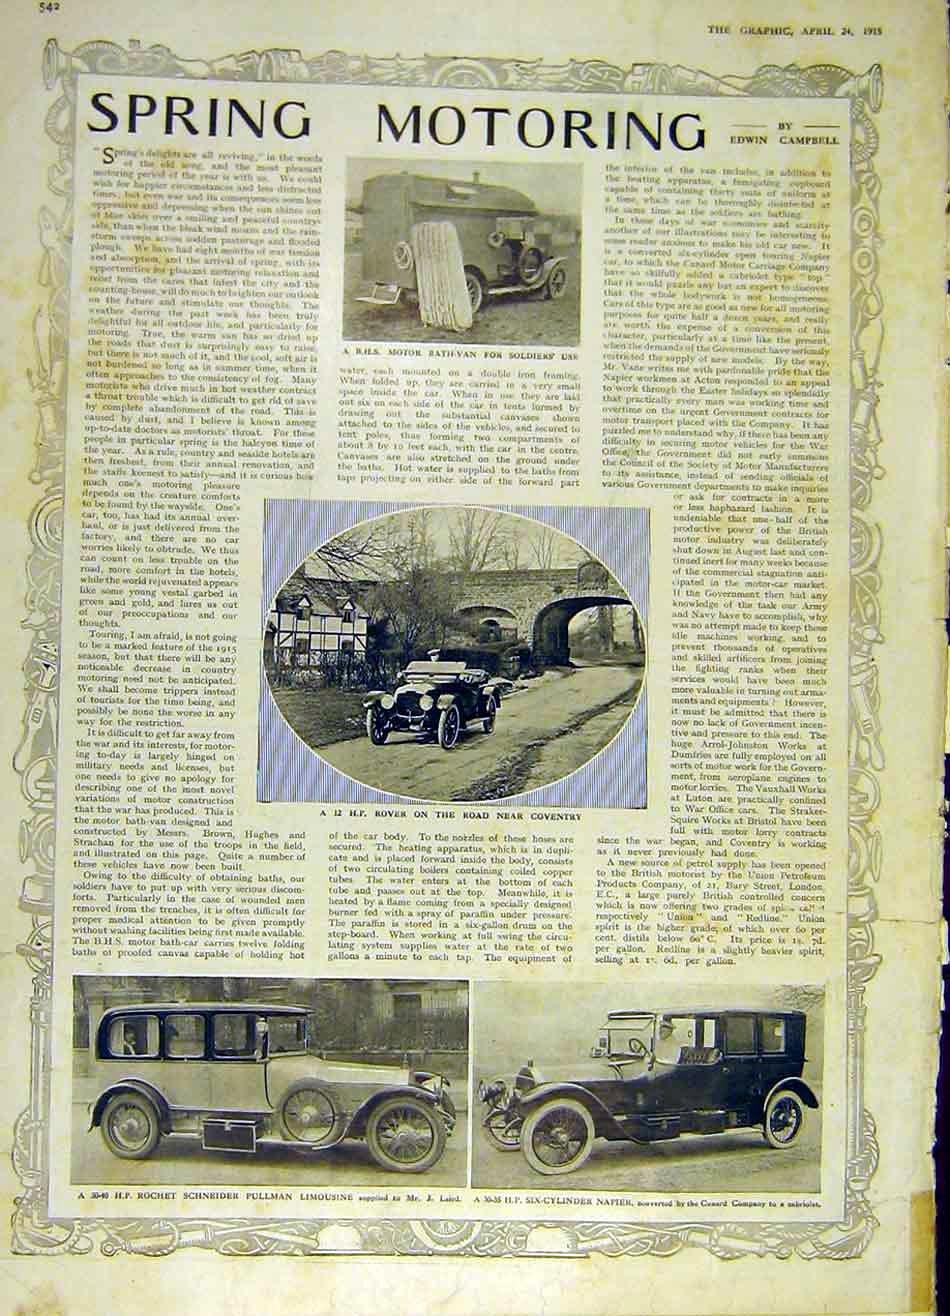 Bhs Motor Bath-Van Soldier Ww1 Rover Pullman Napier Old-print